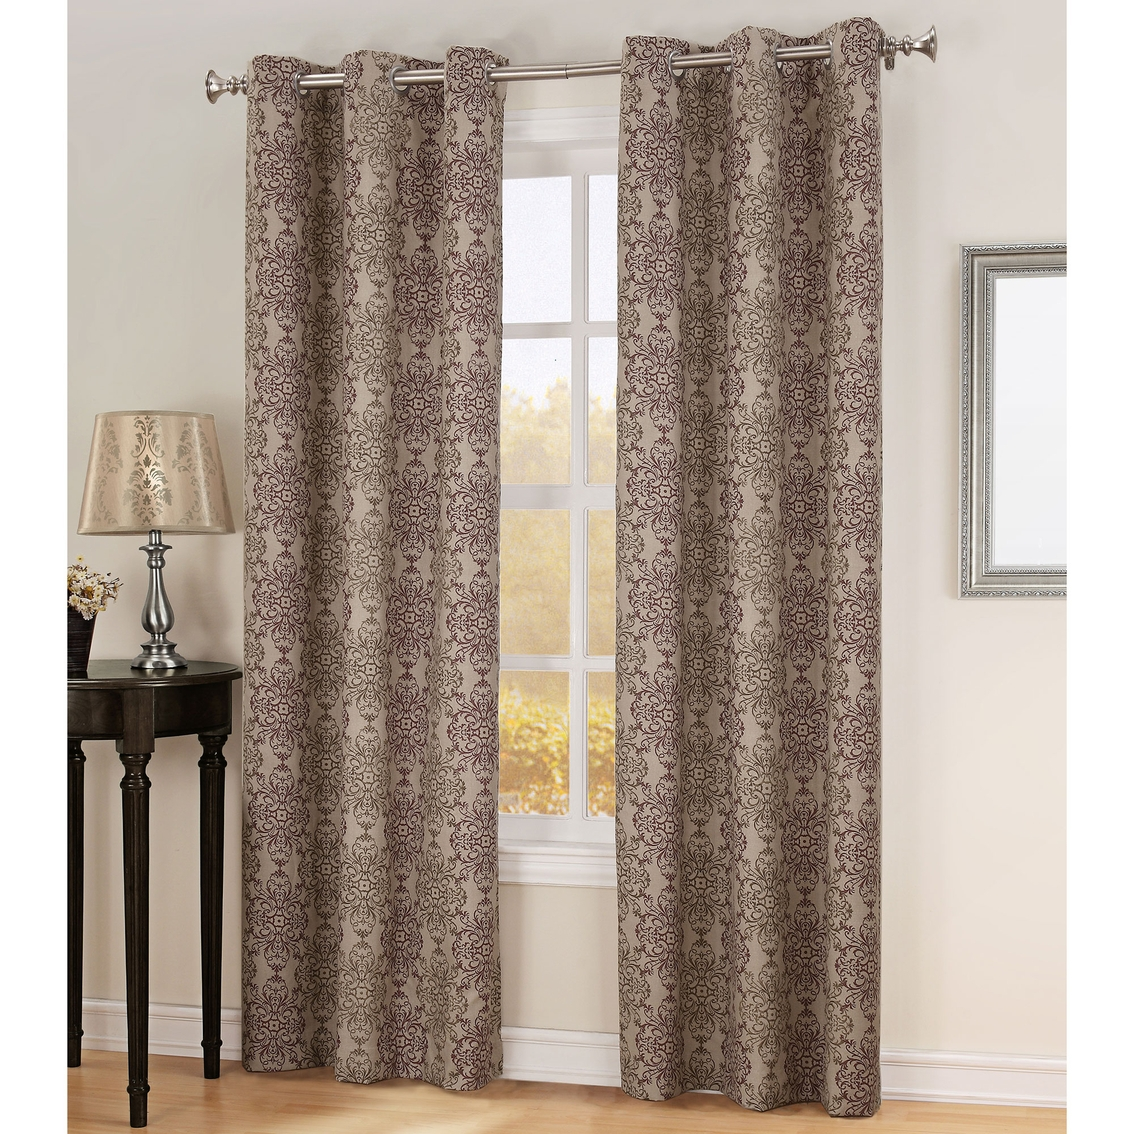 Sun Zero Anika Thermal Lined Curtain Panel Curtains Drapes Within Thermal Lined Drapes (Image 12 of 15)